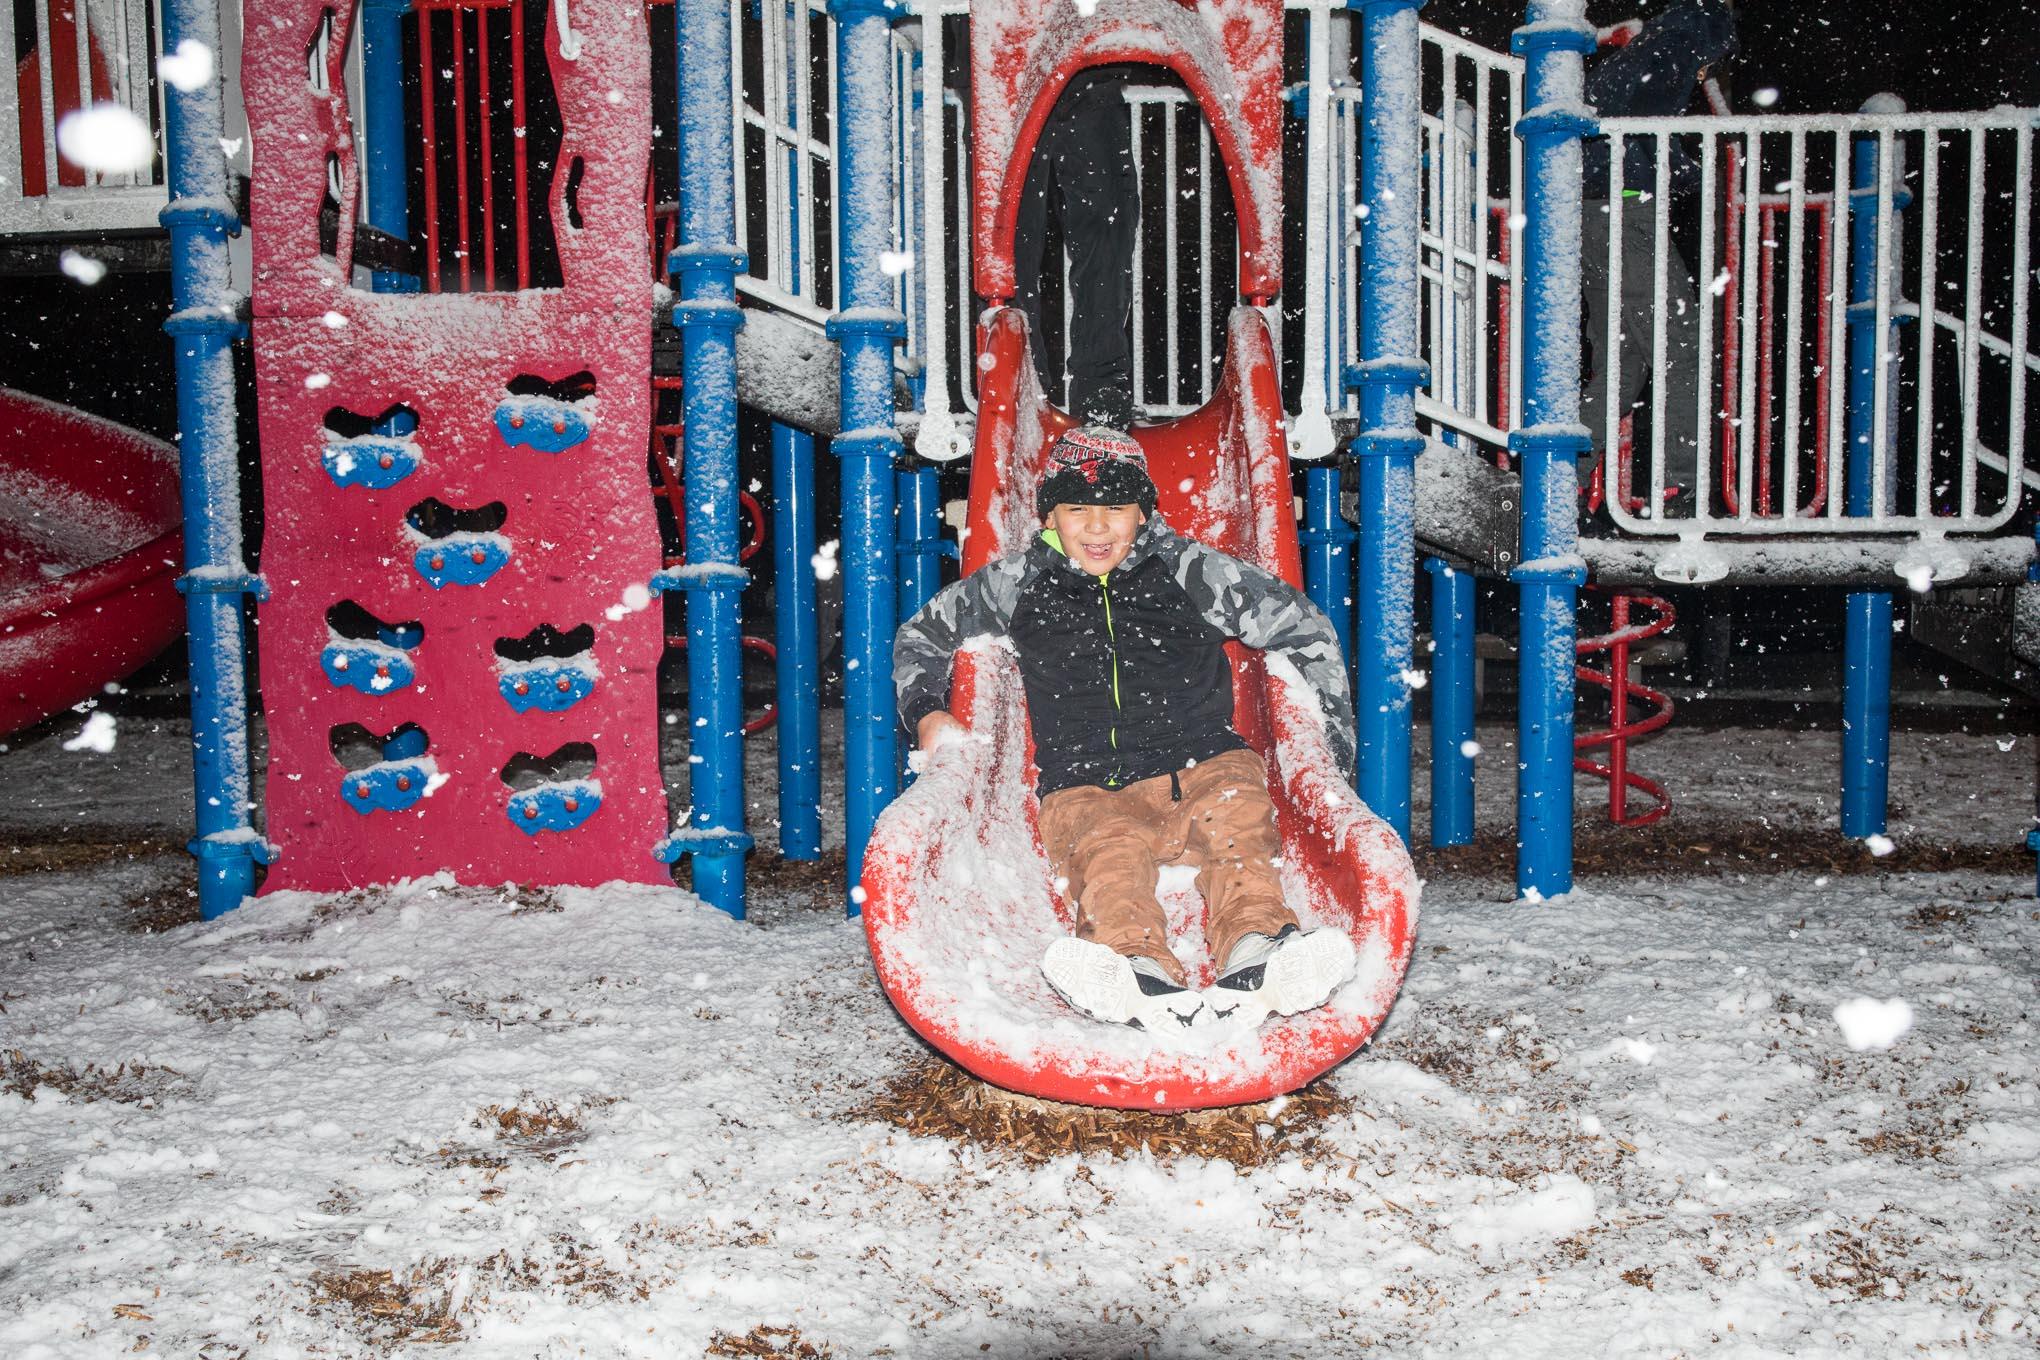 Johnny Alvarez, 10, slides at Pittman-Sullivan Park in the Denver Heights neighborhood.